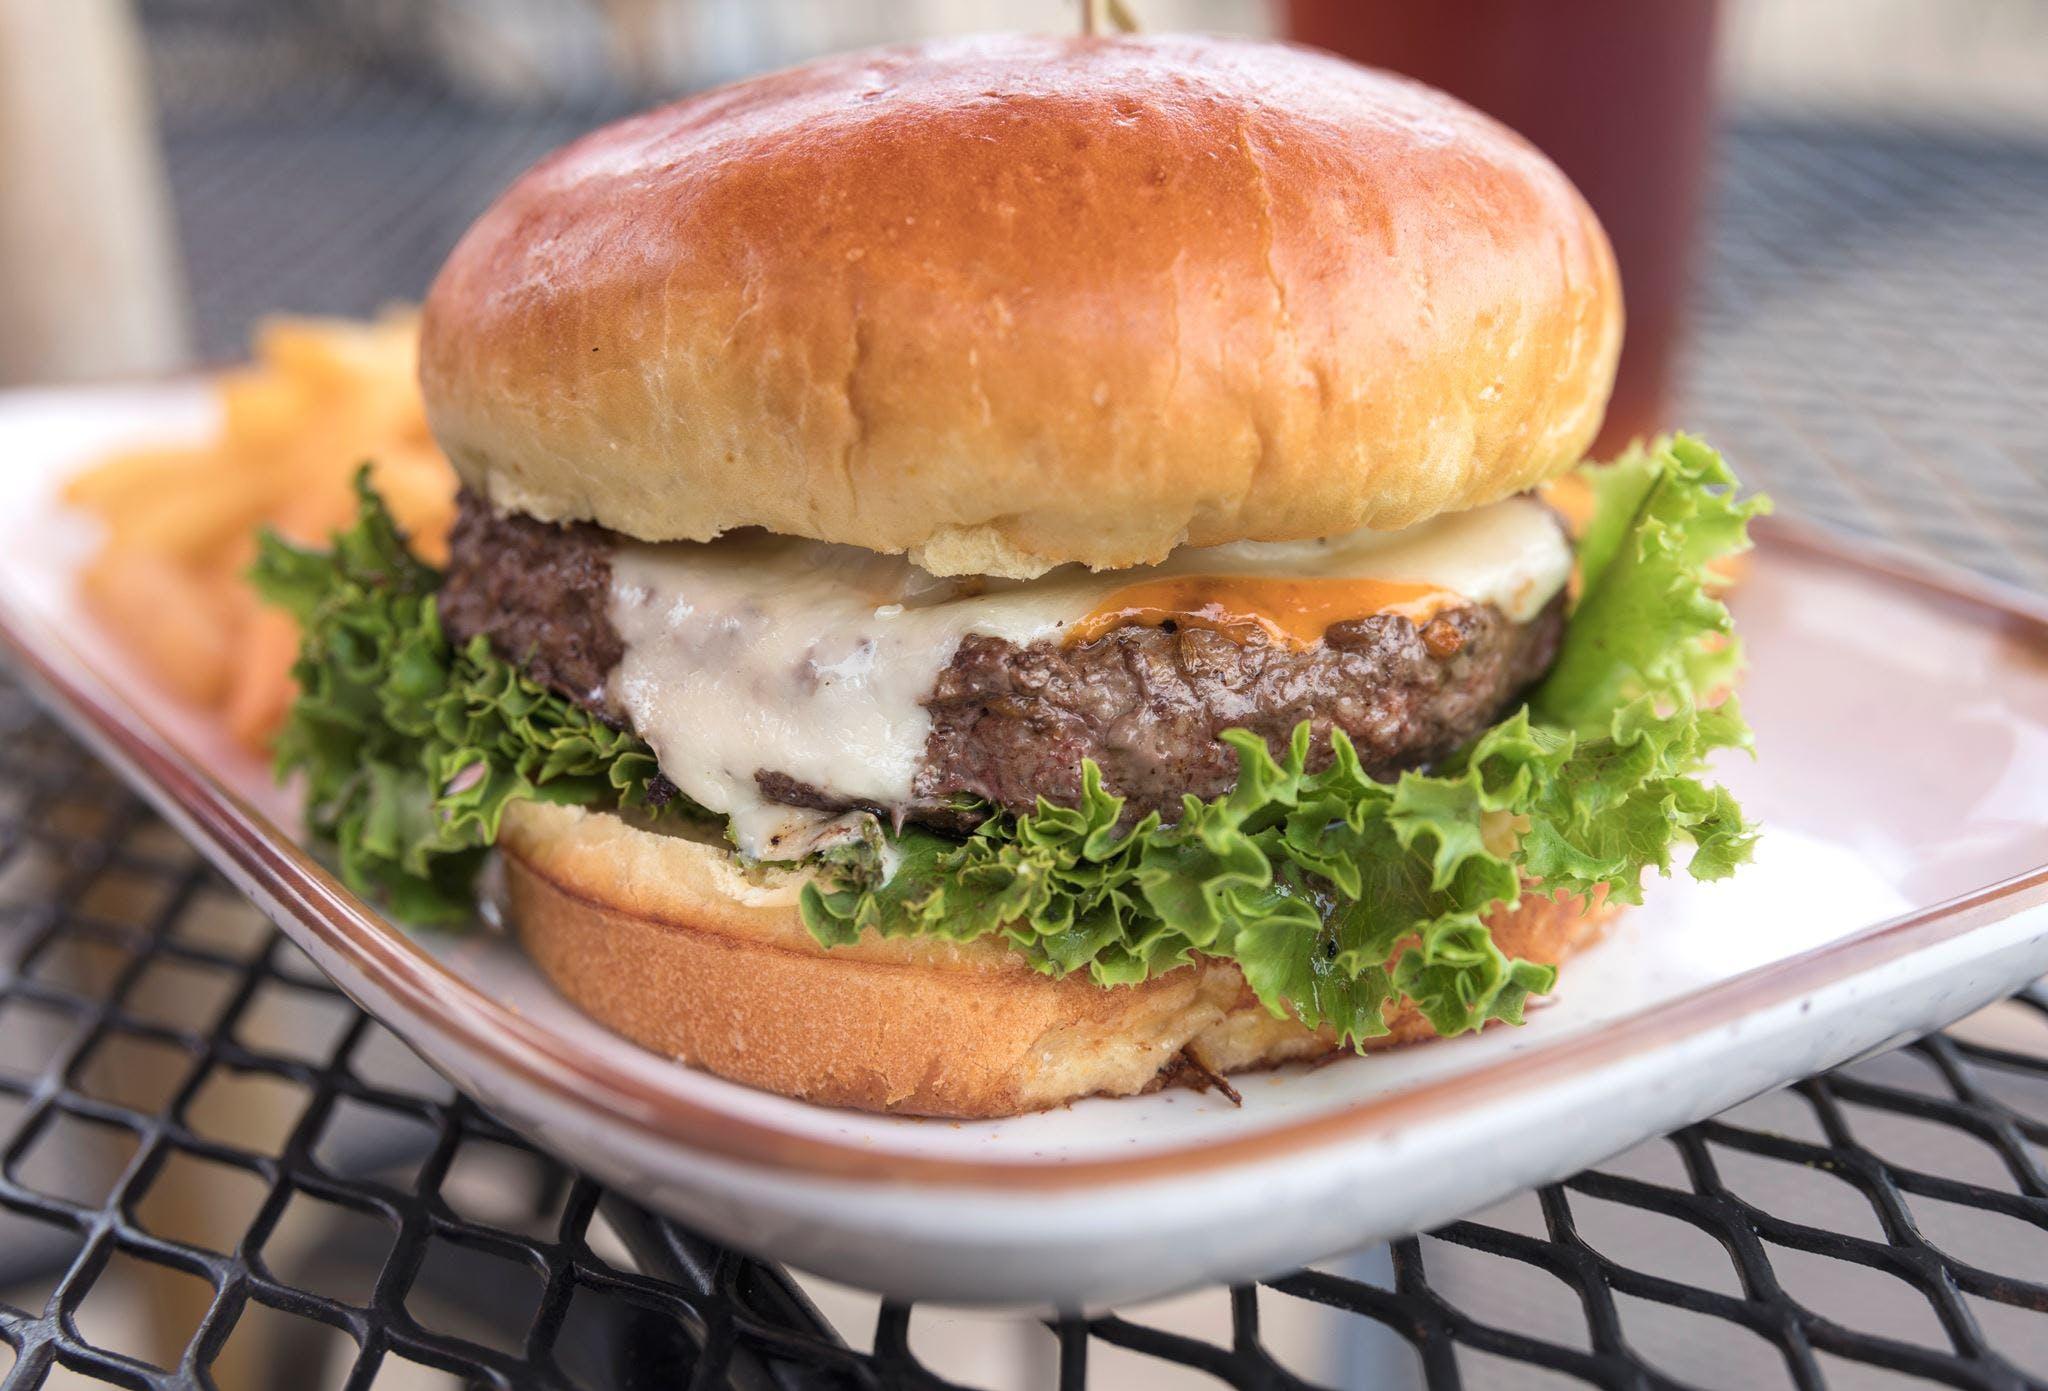 Dockside Tavern Food & Spirits in Oshkosh - Highlight